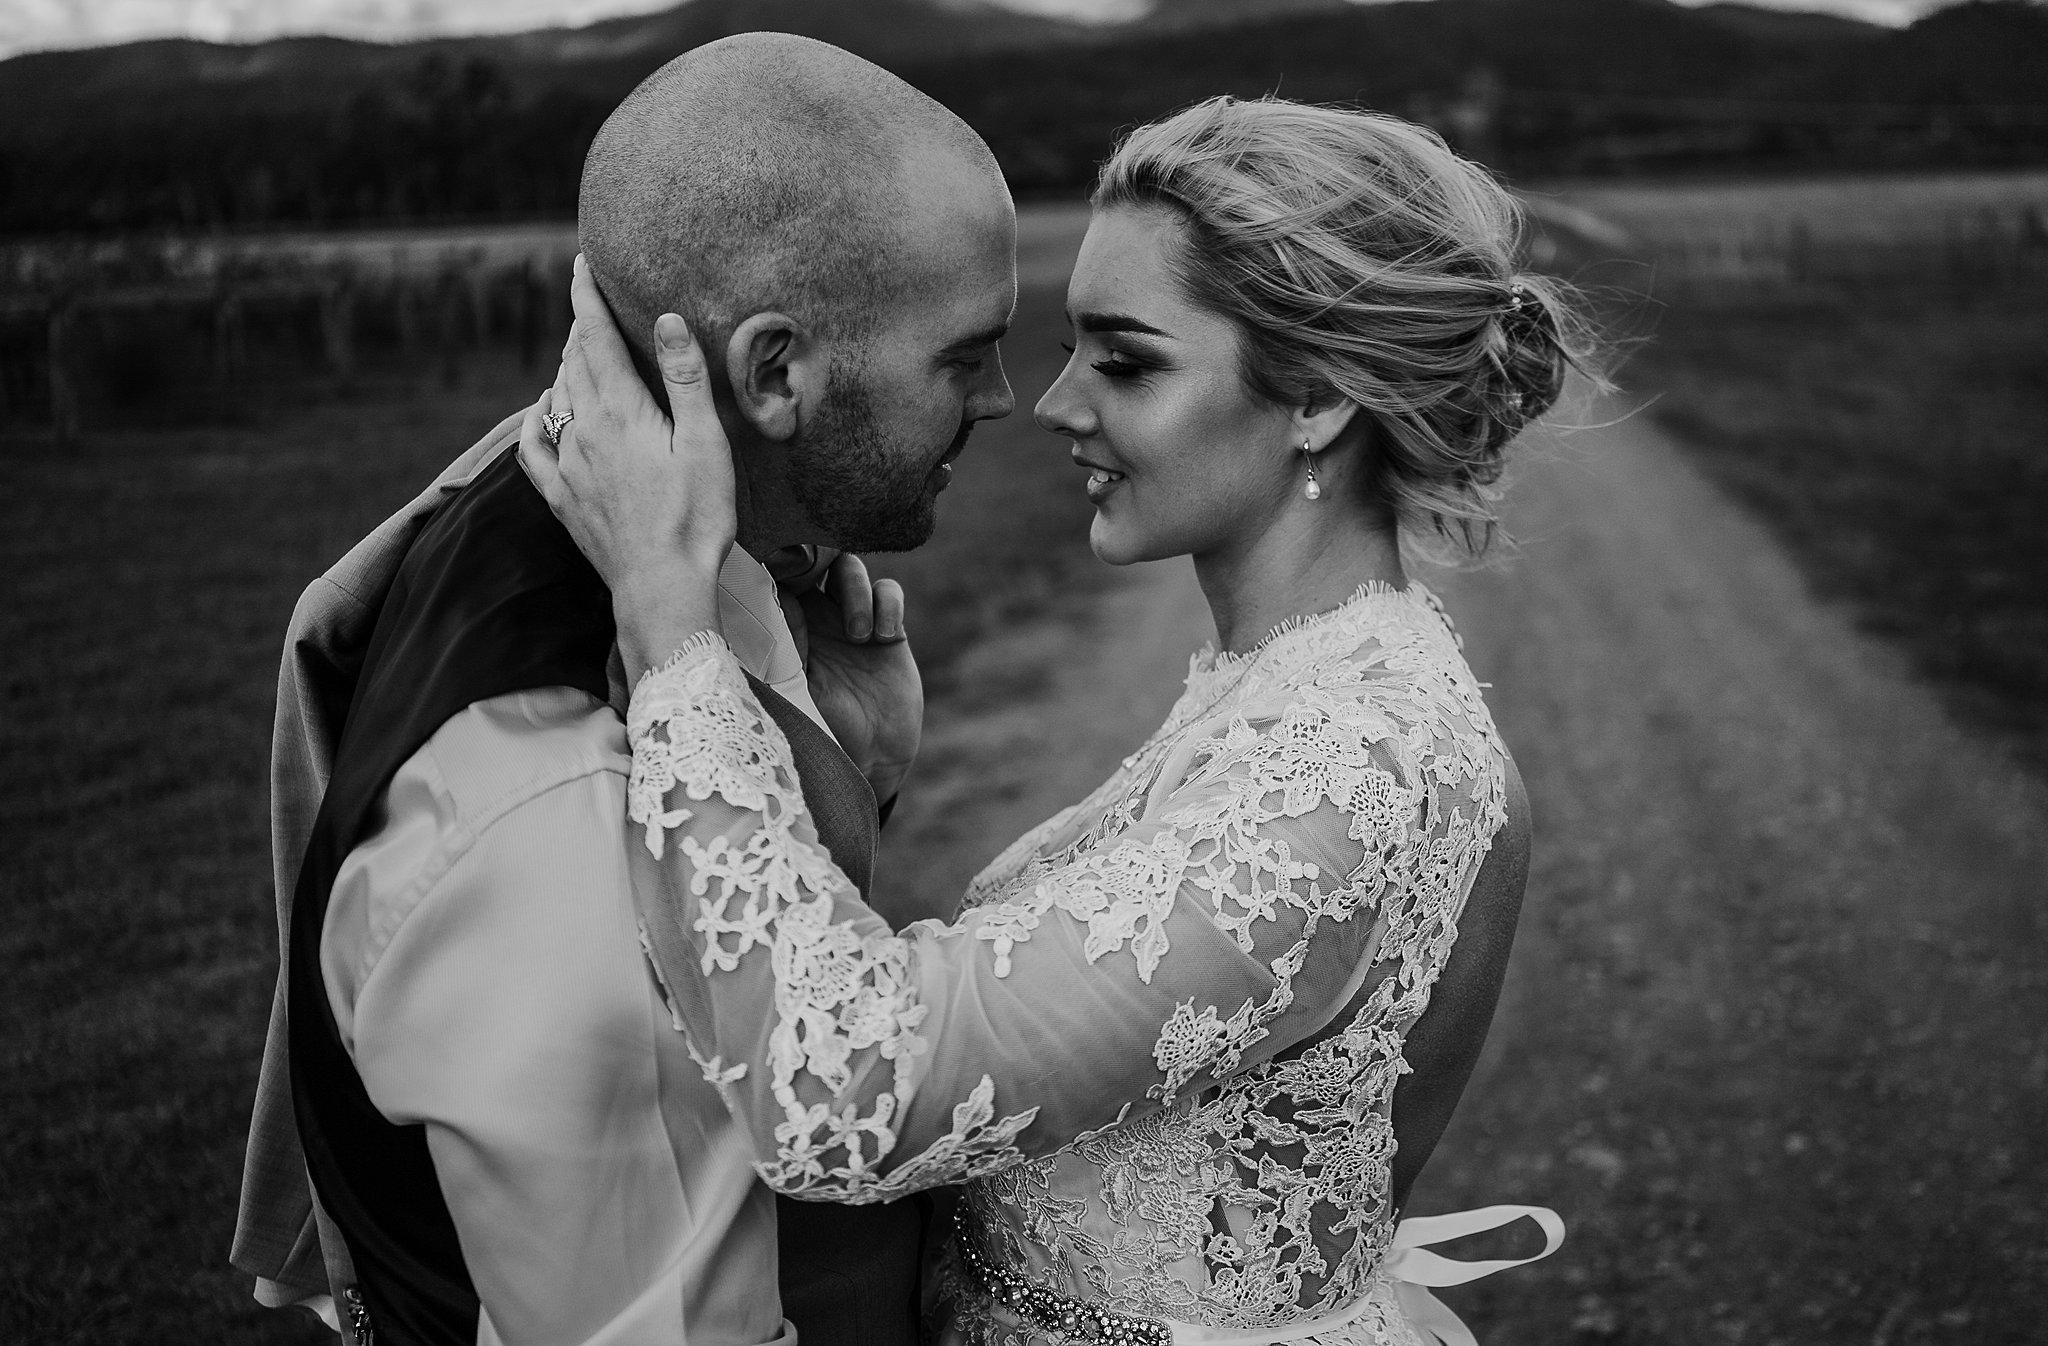 mickalathomas_puremacphotography_weddingphotographer_couplephotographer_Sheppartonphotographer_3462.jpg